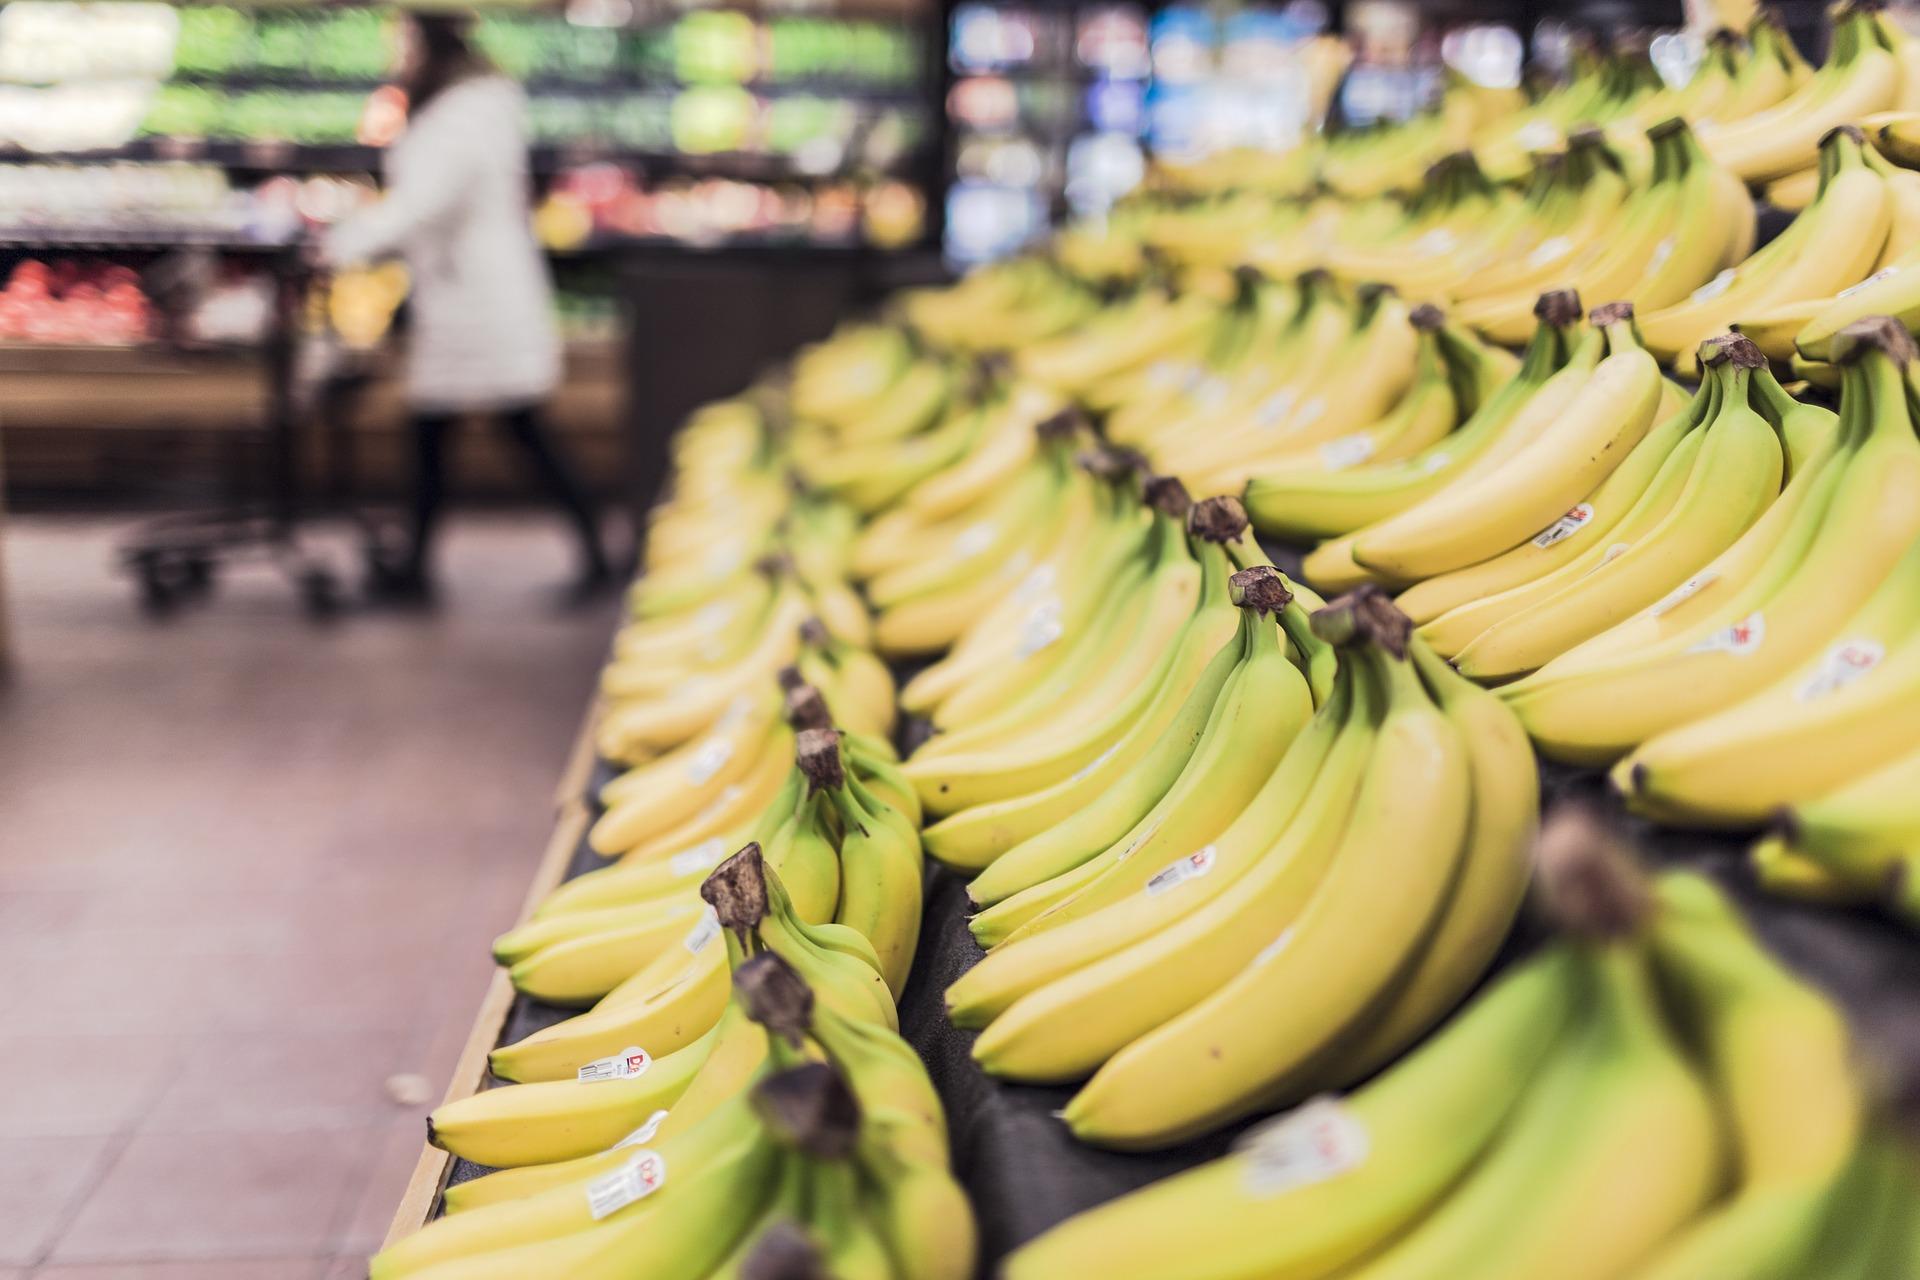 bananas-698608_1920.jpg